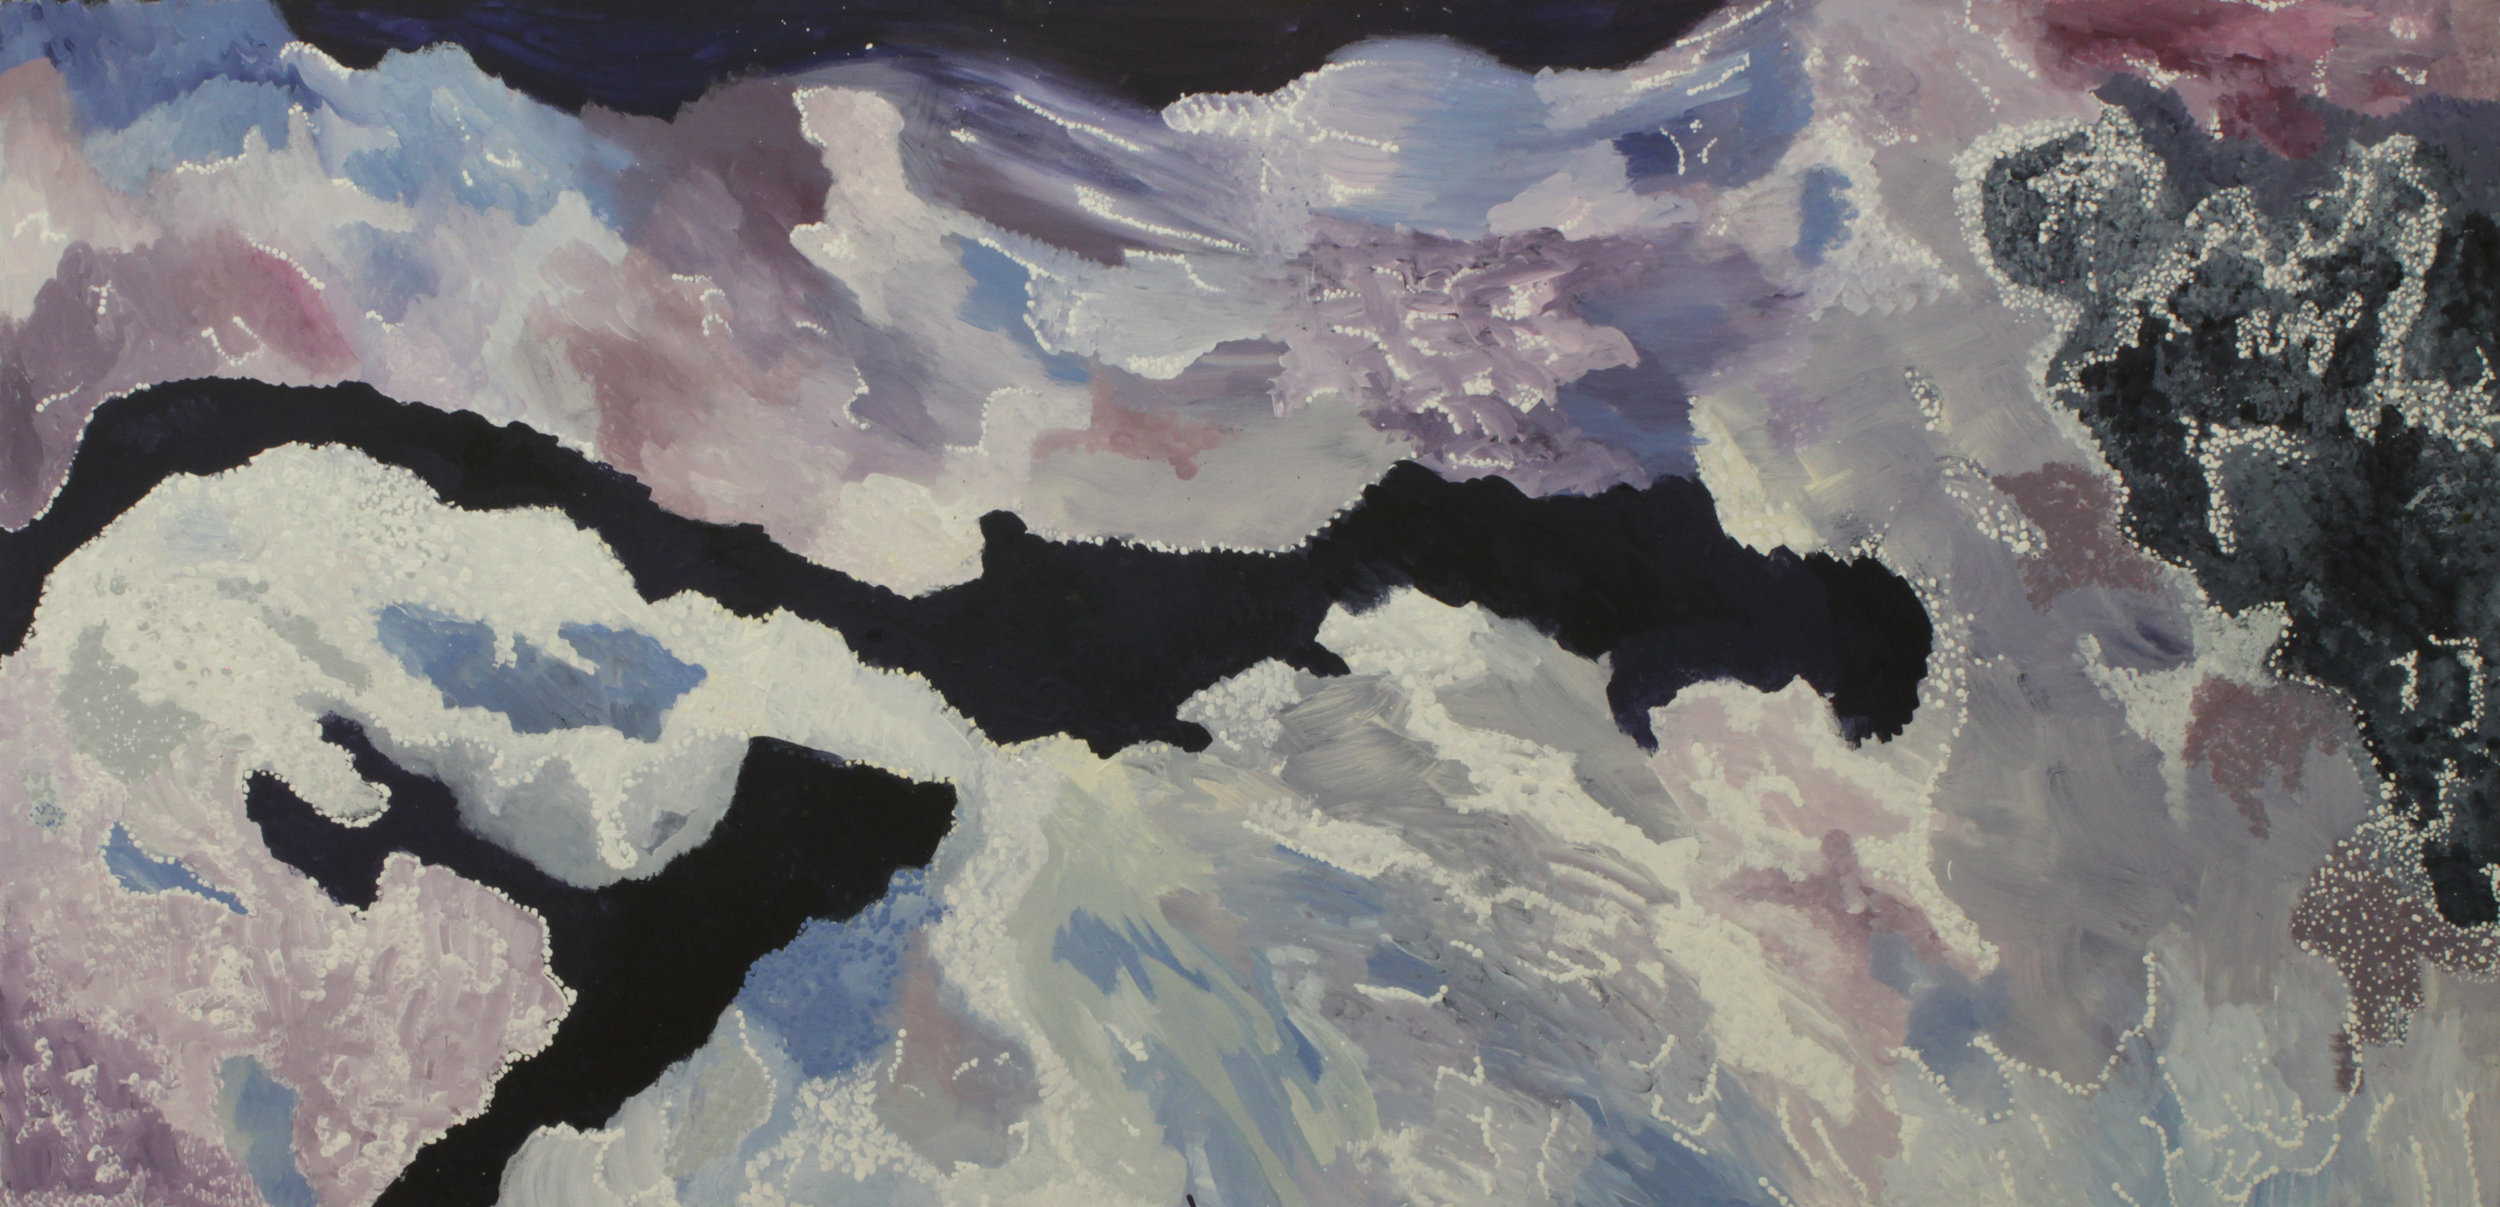 LANGALIKI LEWIS  Kapi Ngangkali Tjukurpa (Storm Cloud Story), 2017  840 x 1700mm Acrylic on Linen Catalog #408-17   EMAIL INQUIRY